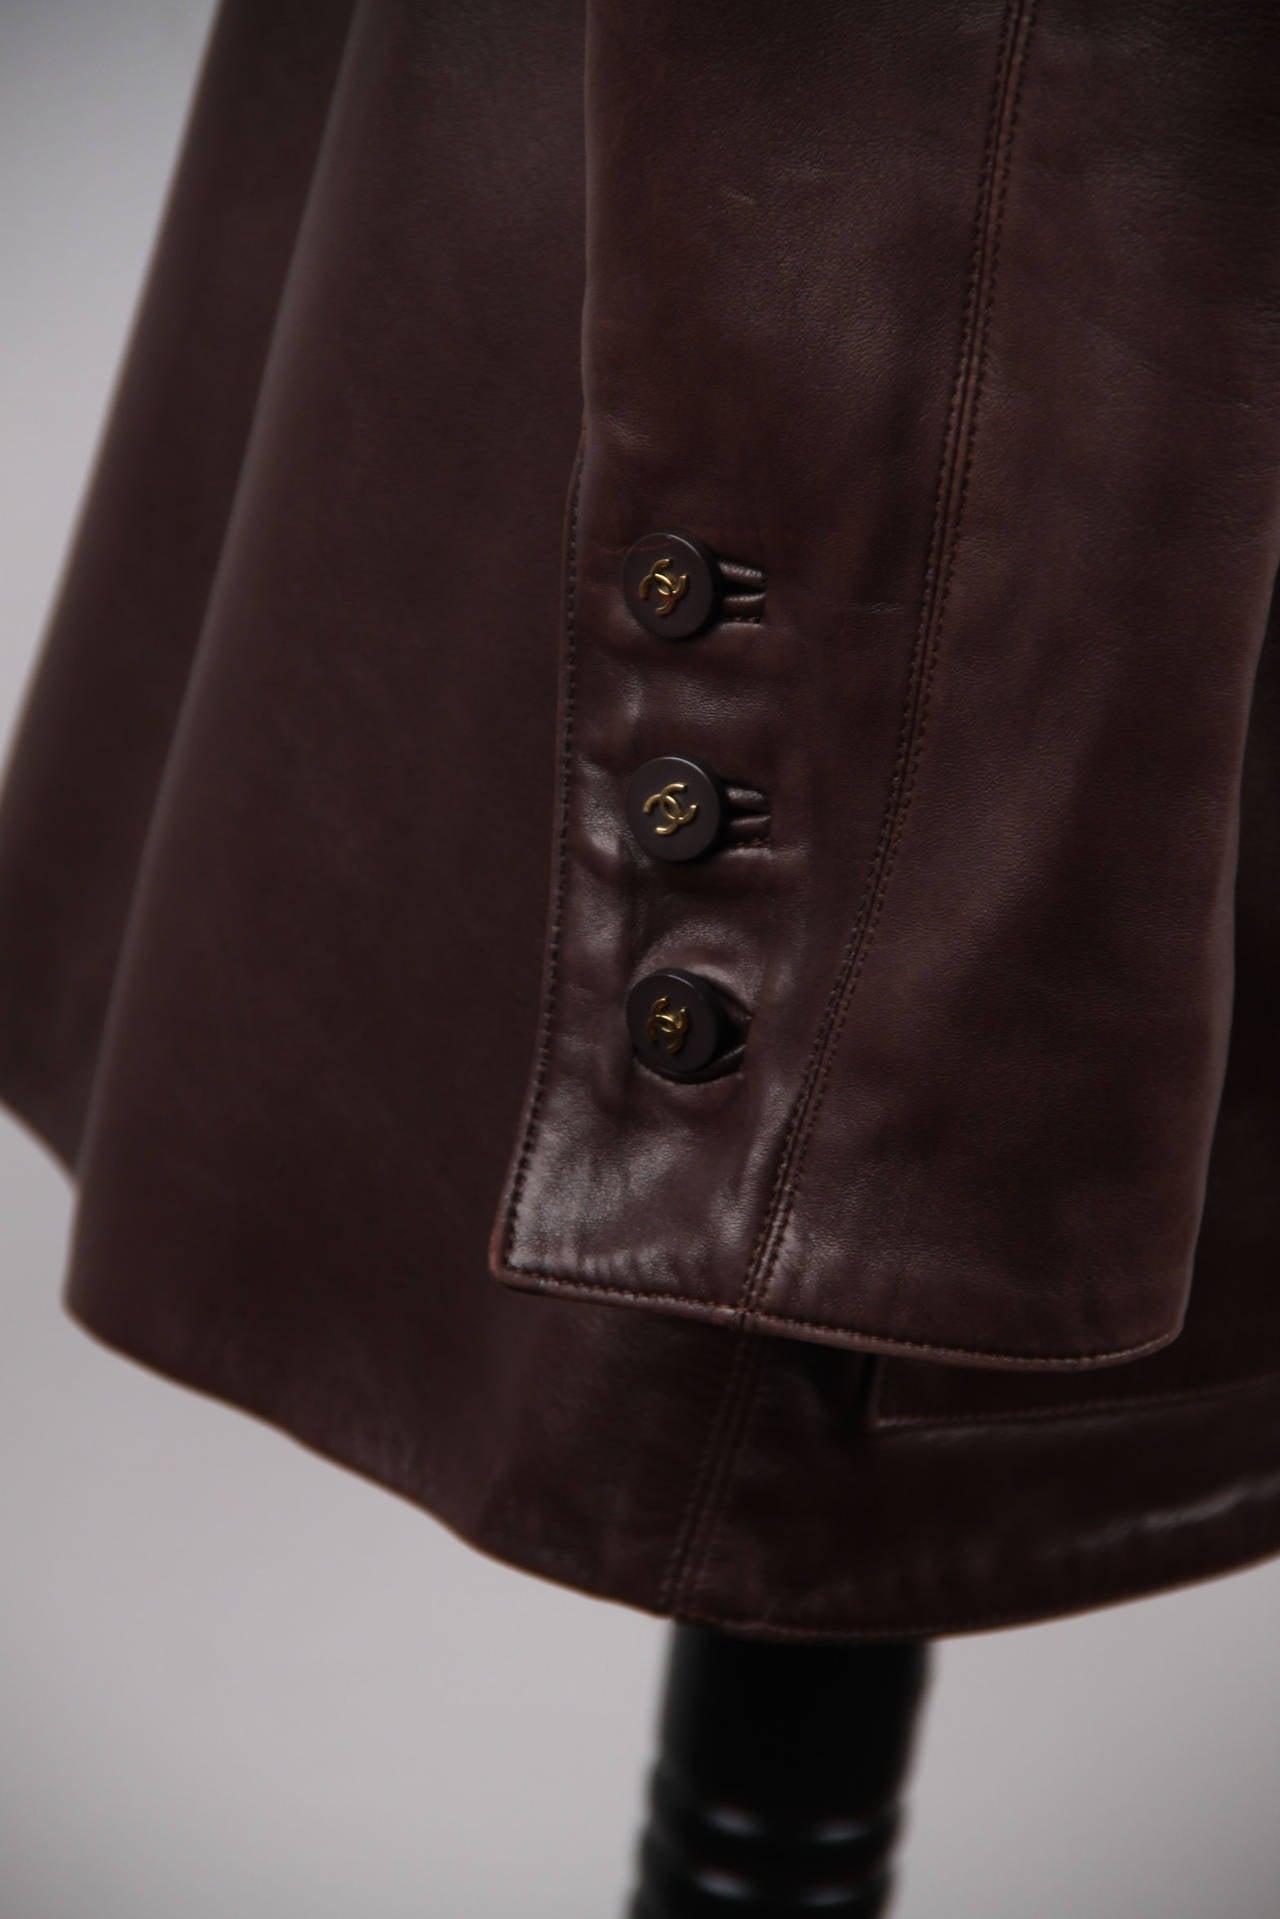 CHANEL BOUTIQUE VINTAGE Chocolate Brown LEATHER JACKET Blazer SIZE 38 FR 6